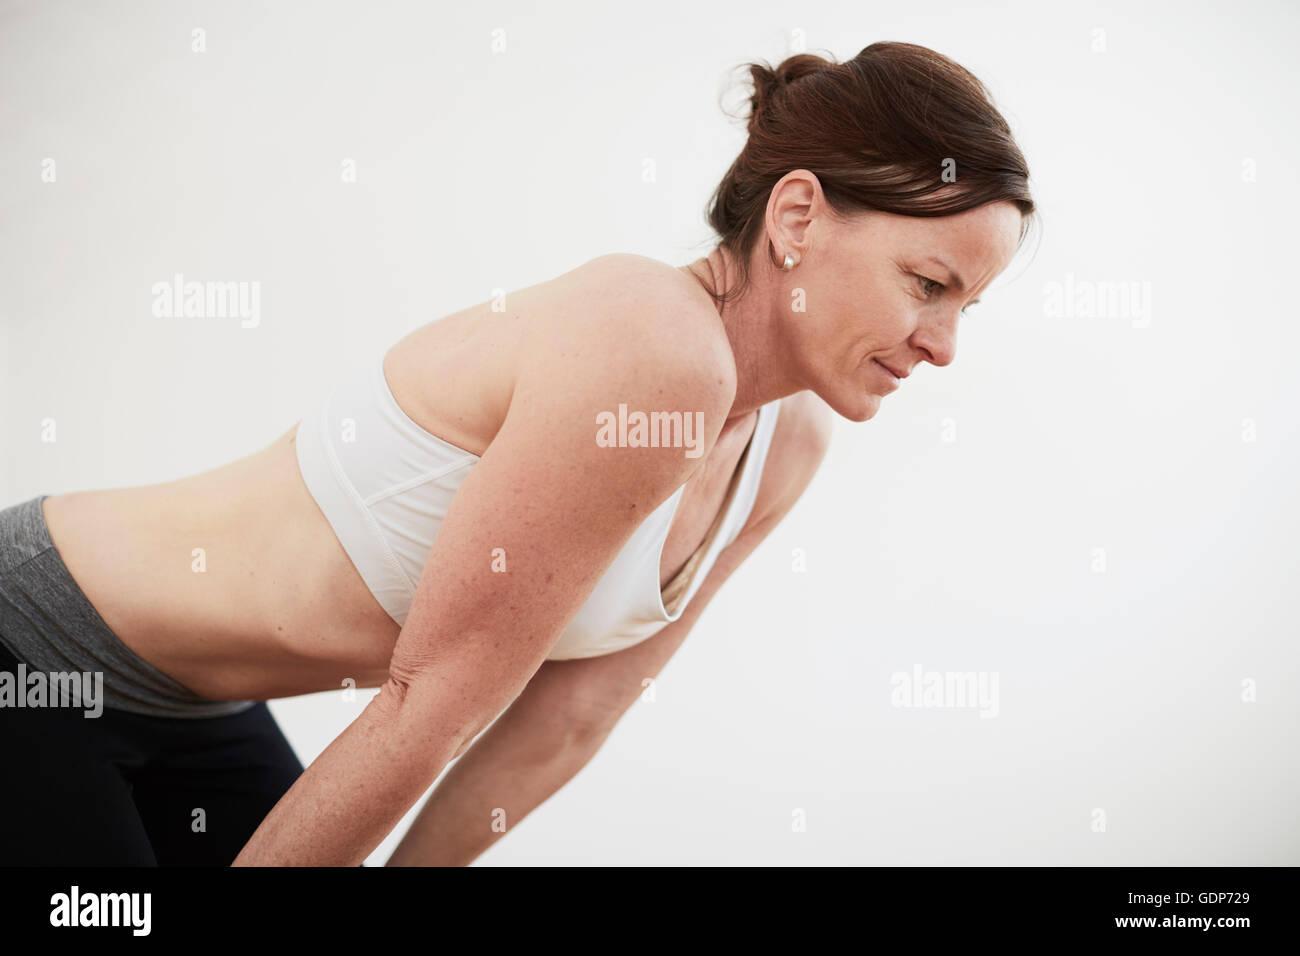 Woman in exercise studio wearing crop top bending forward - Stock Image